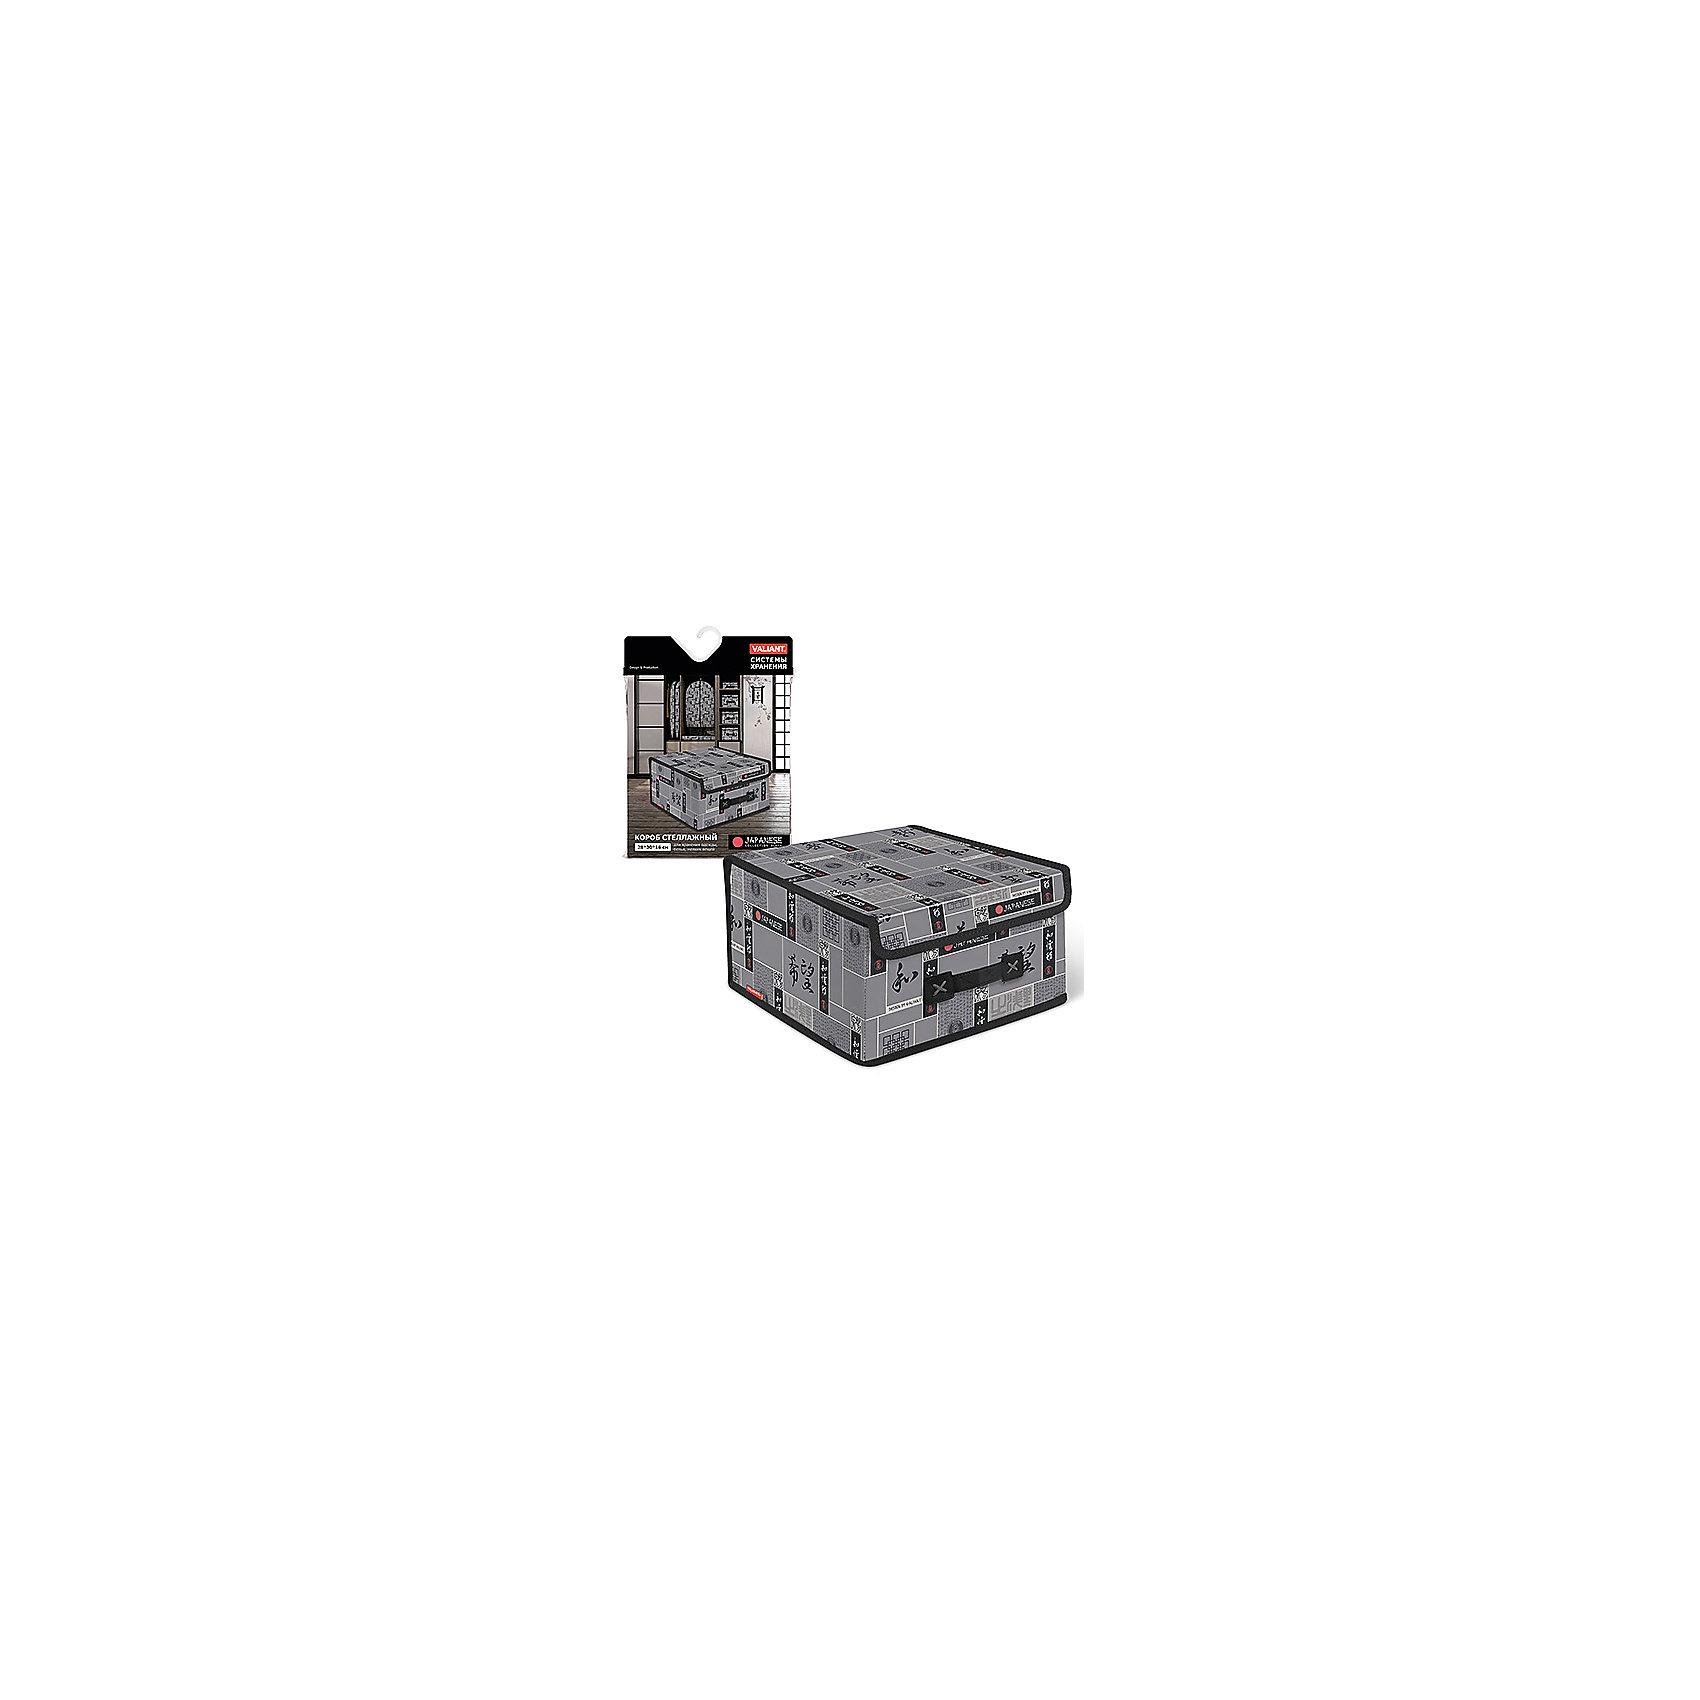 VALIANT Короб стеллажный с крышкой, малый, 28*30*16 см, JAPANESE BLACK, Valiant